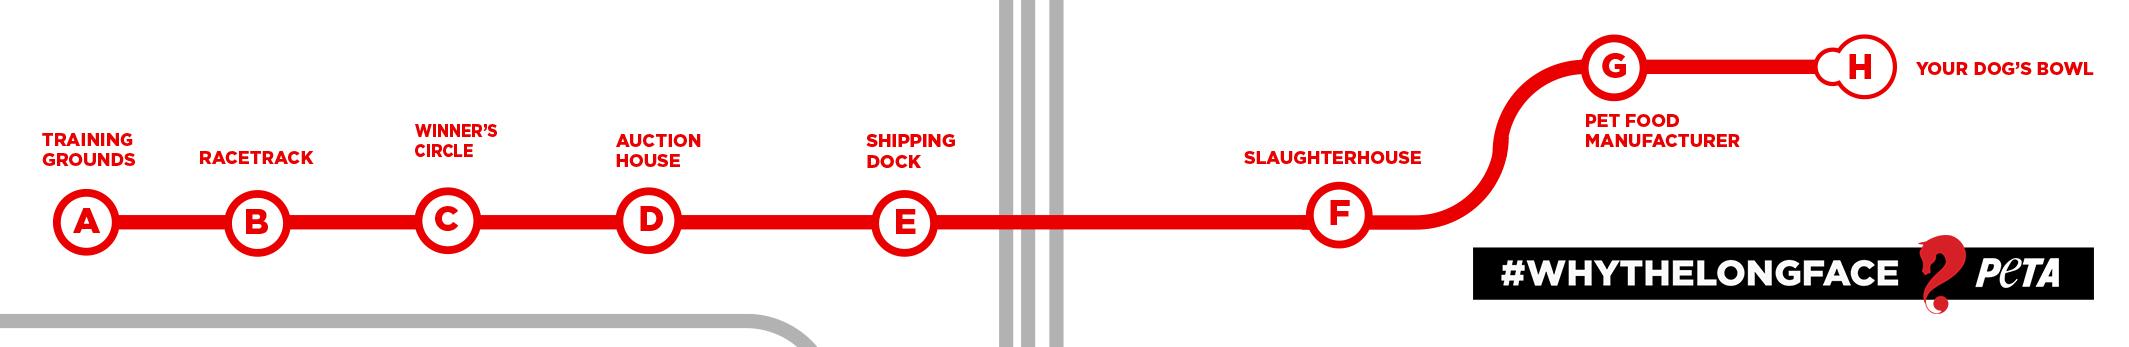 full-subway-map-on-train.jpg